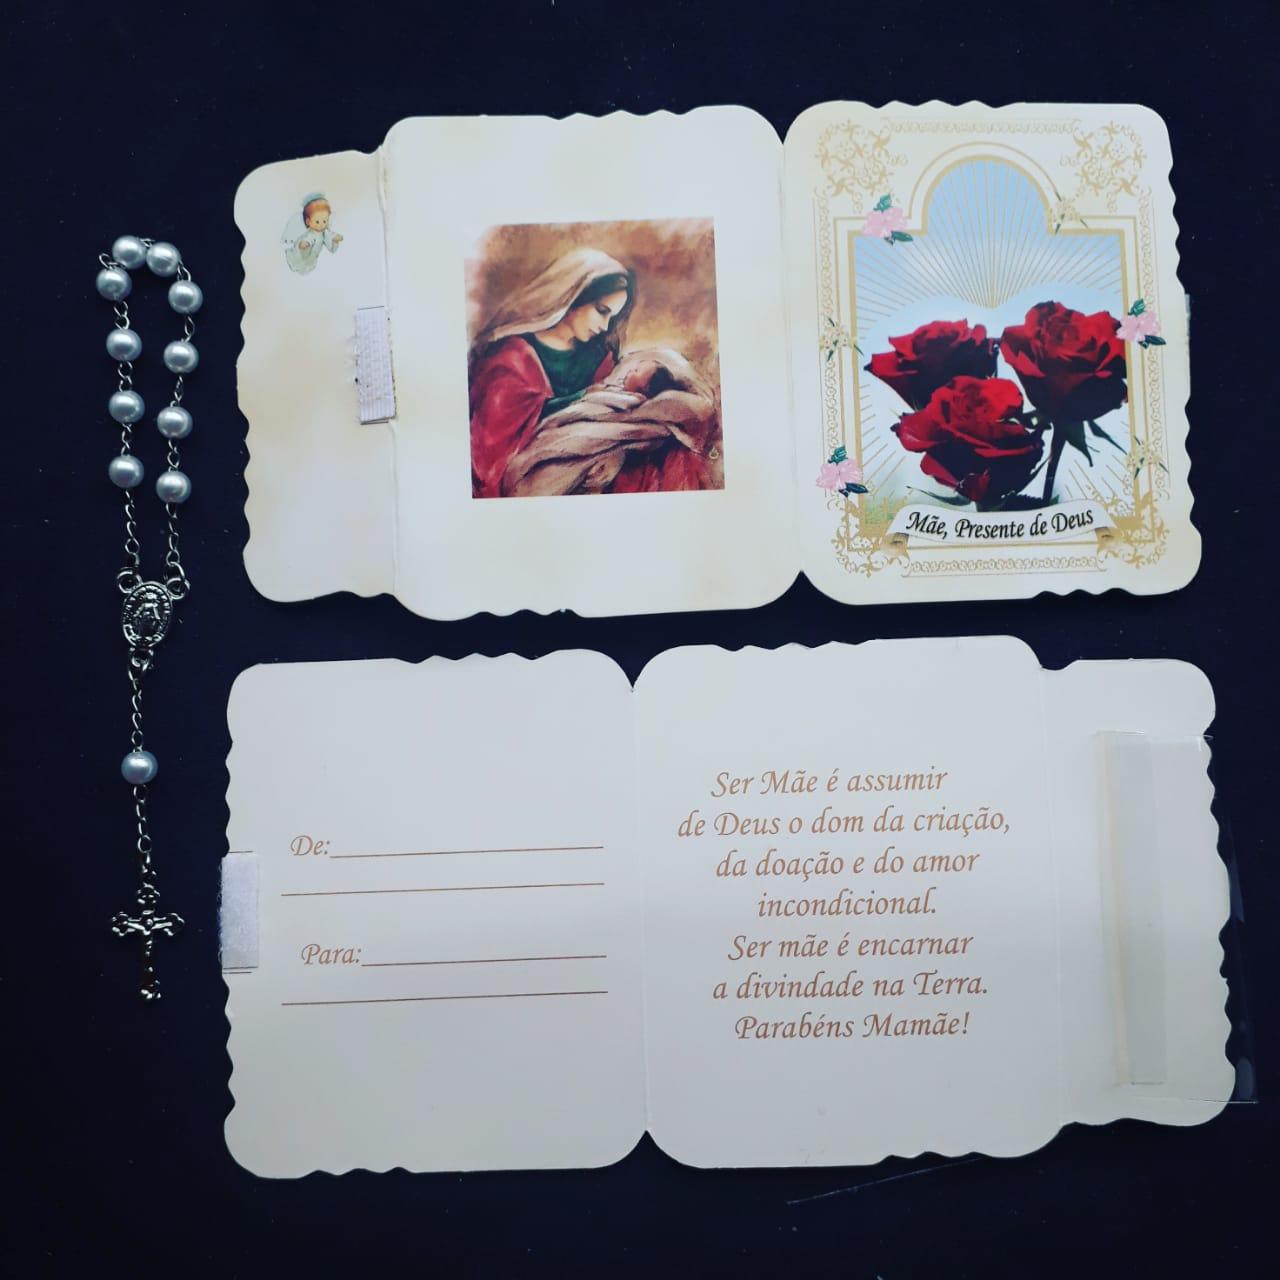 WE20 - Lembrança Dia das Mães c/ Dezena Perolada  - VindVedShop - Distribuidora Catolica